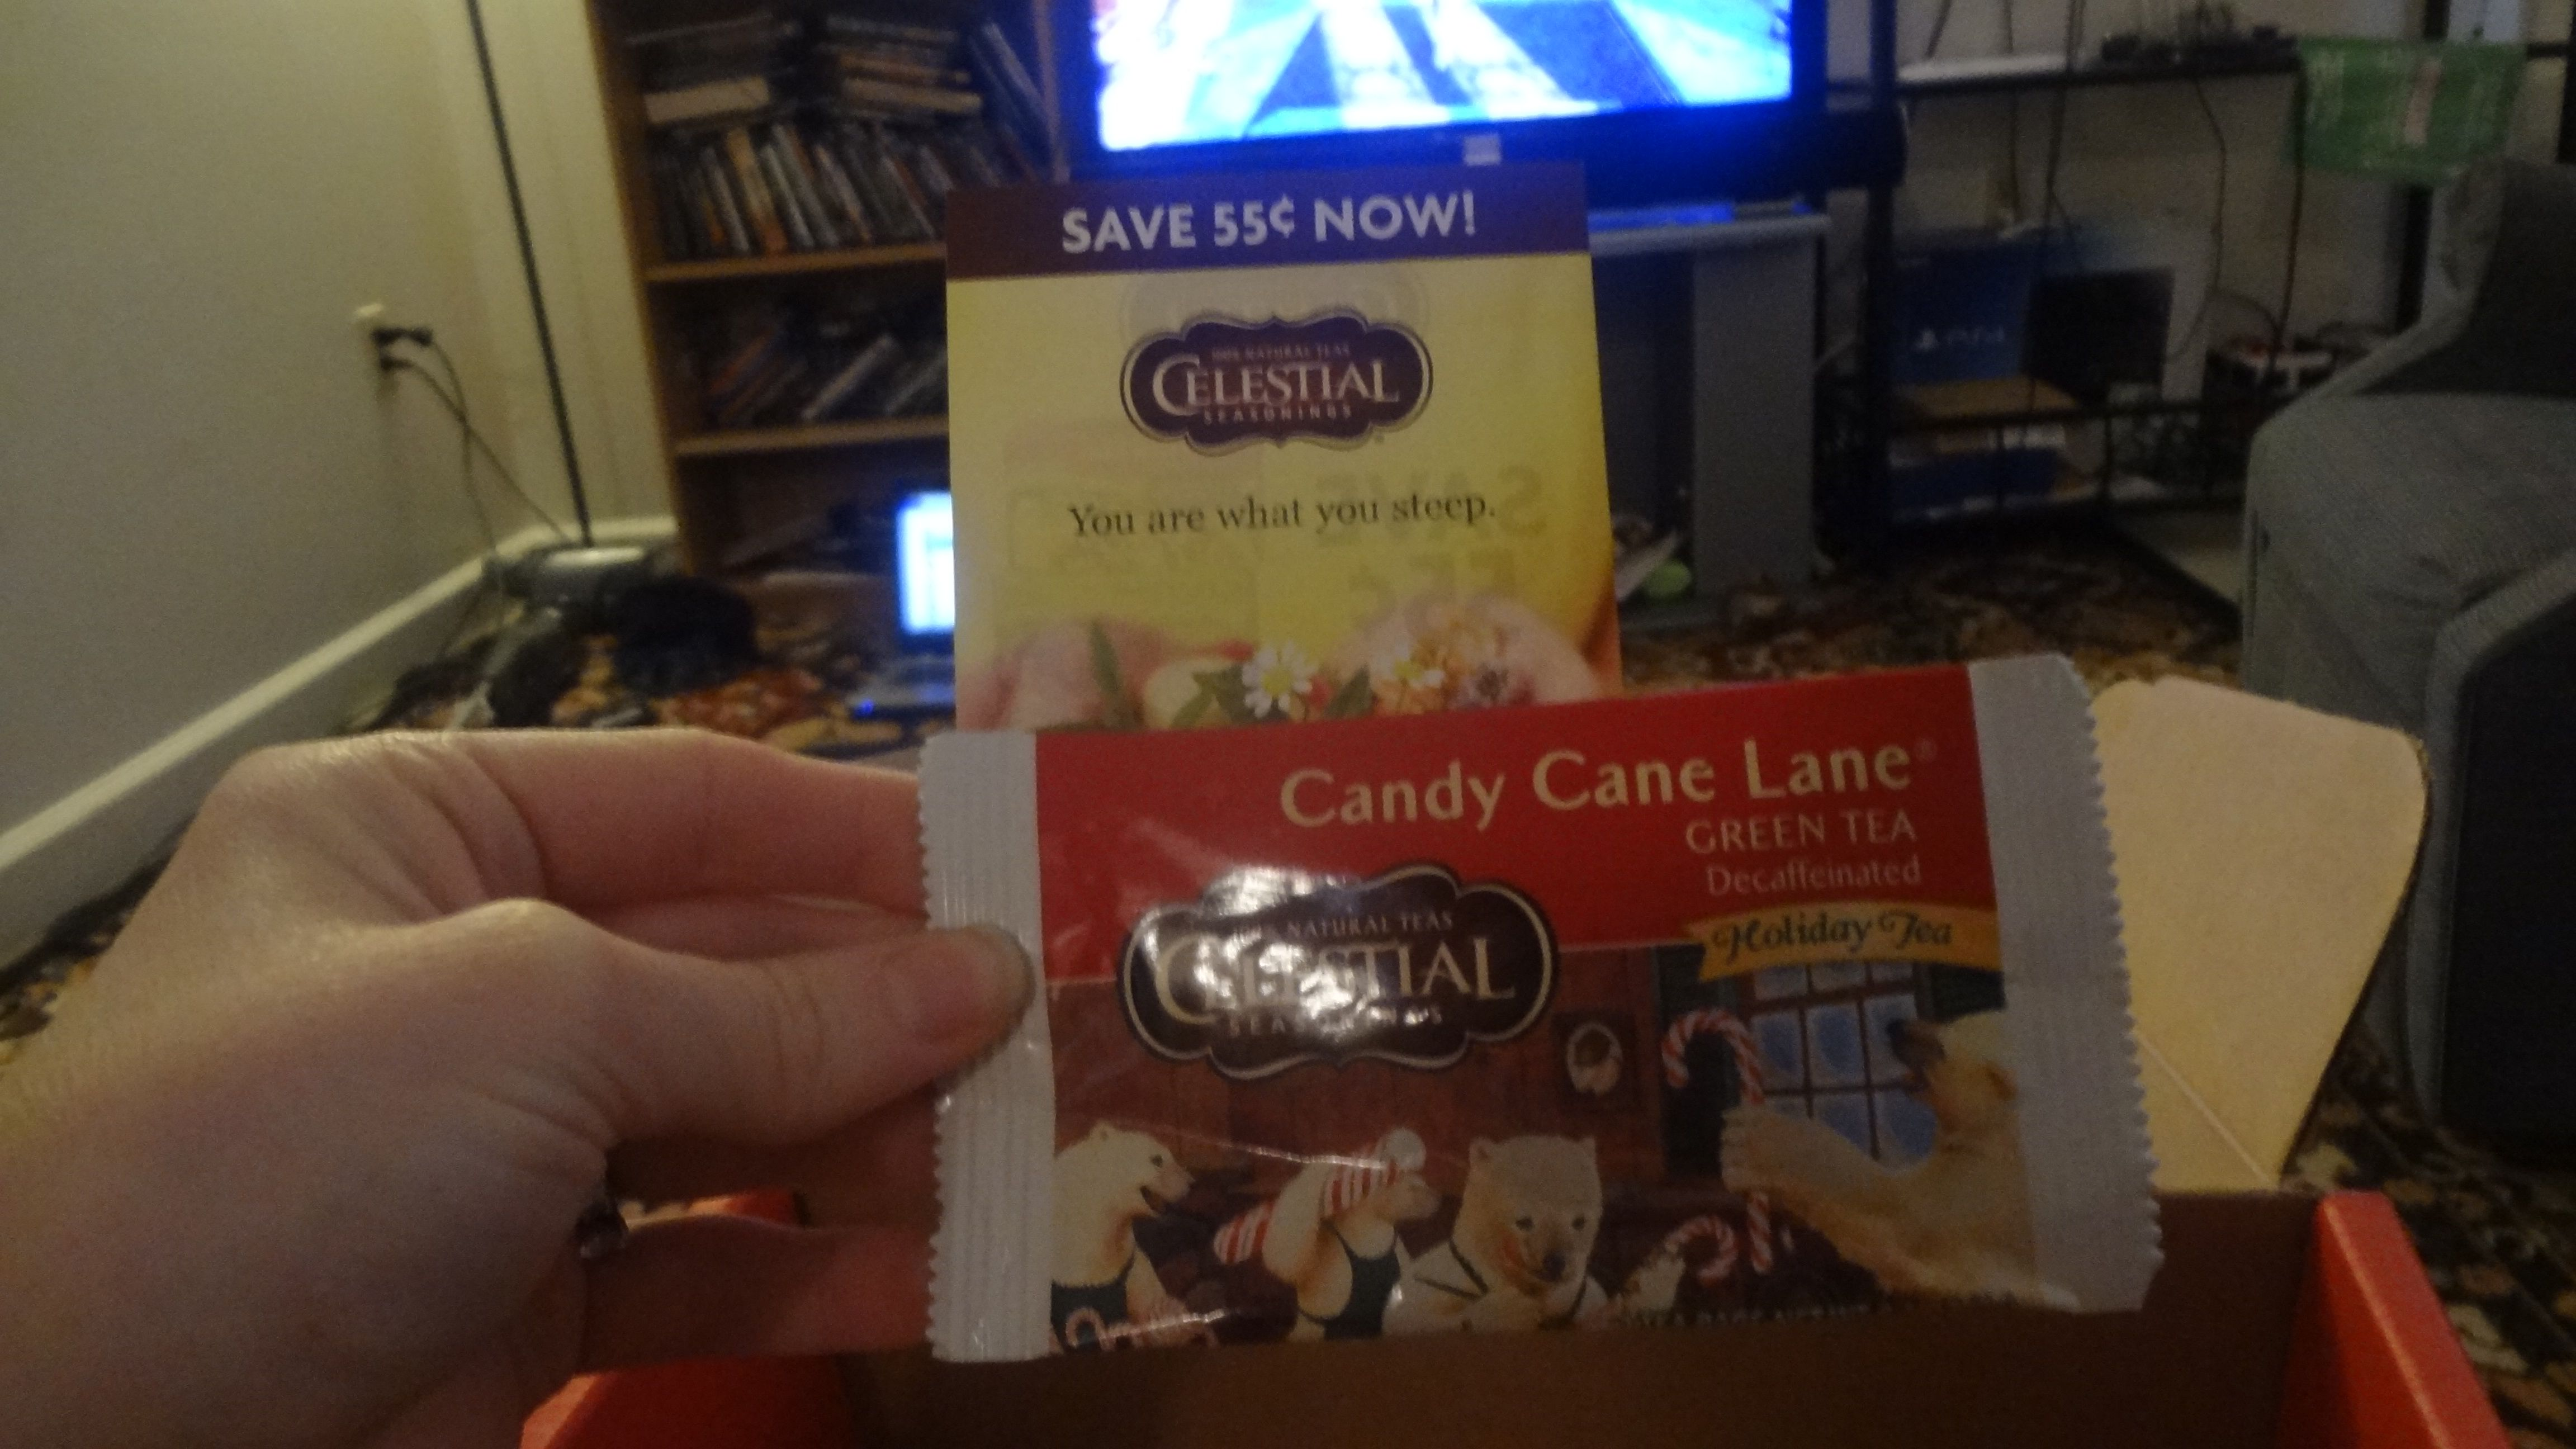 Celestial Seasonings Candy Cane Lane tea Candy cane tea